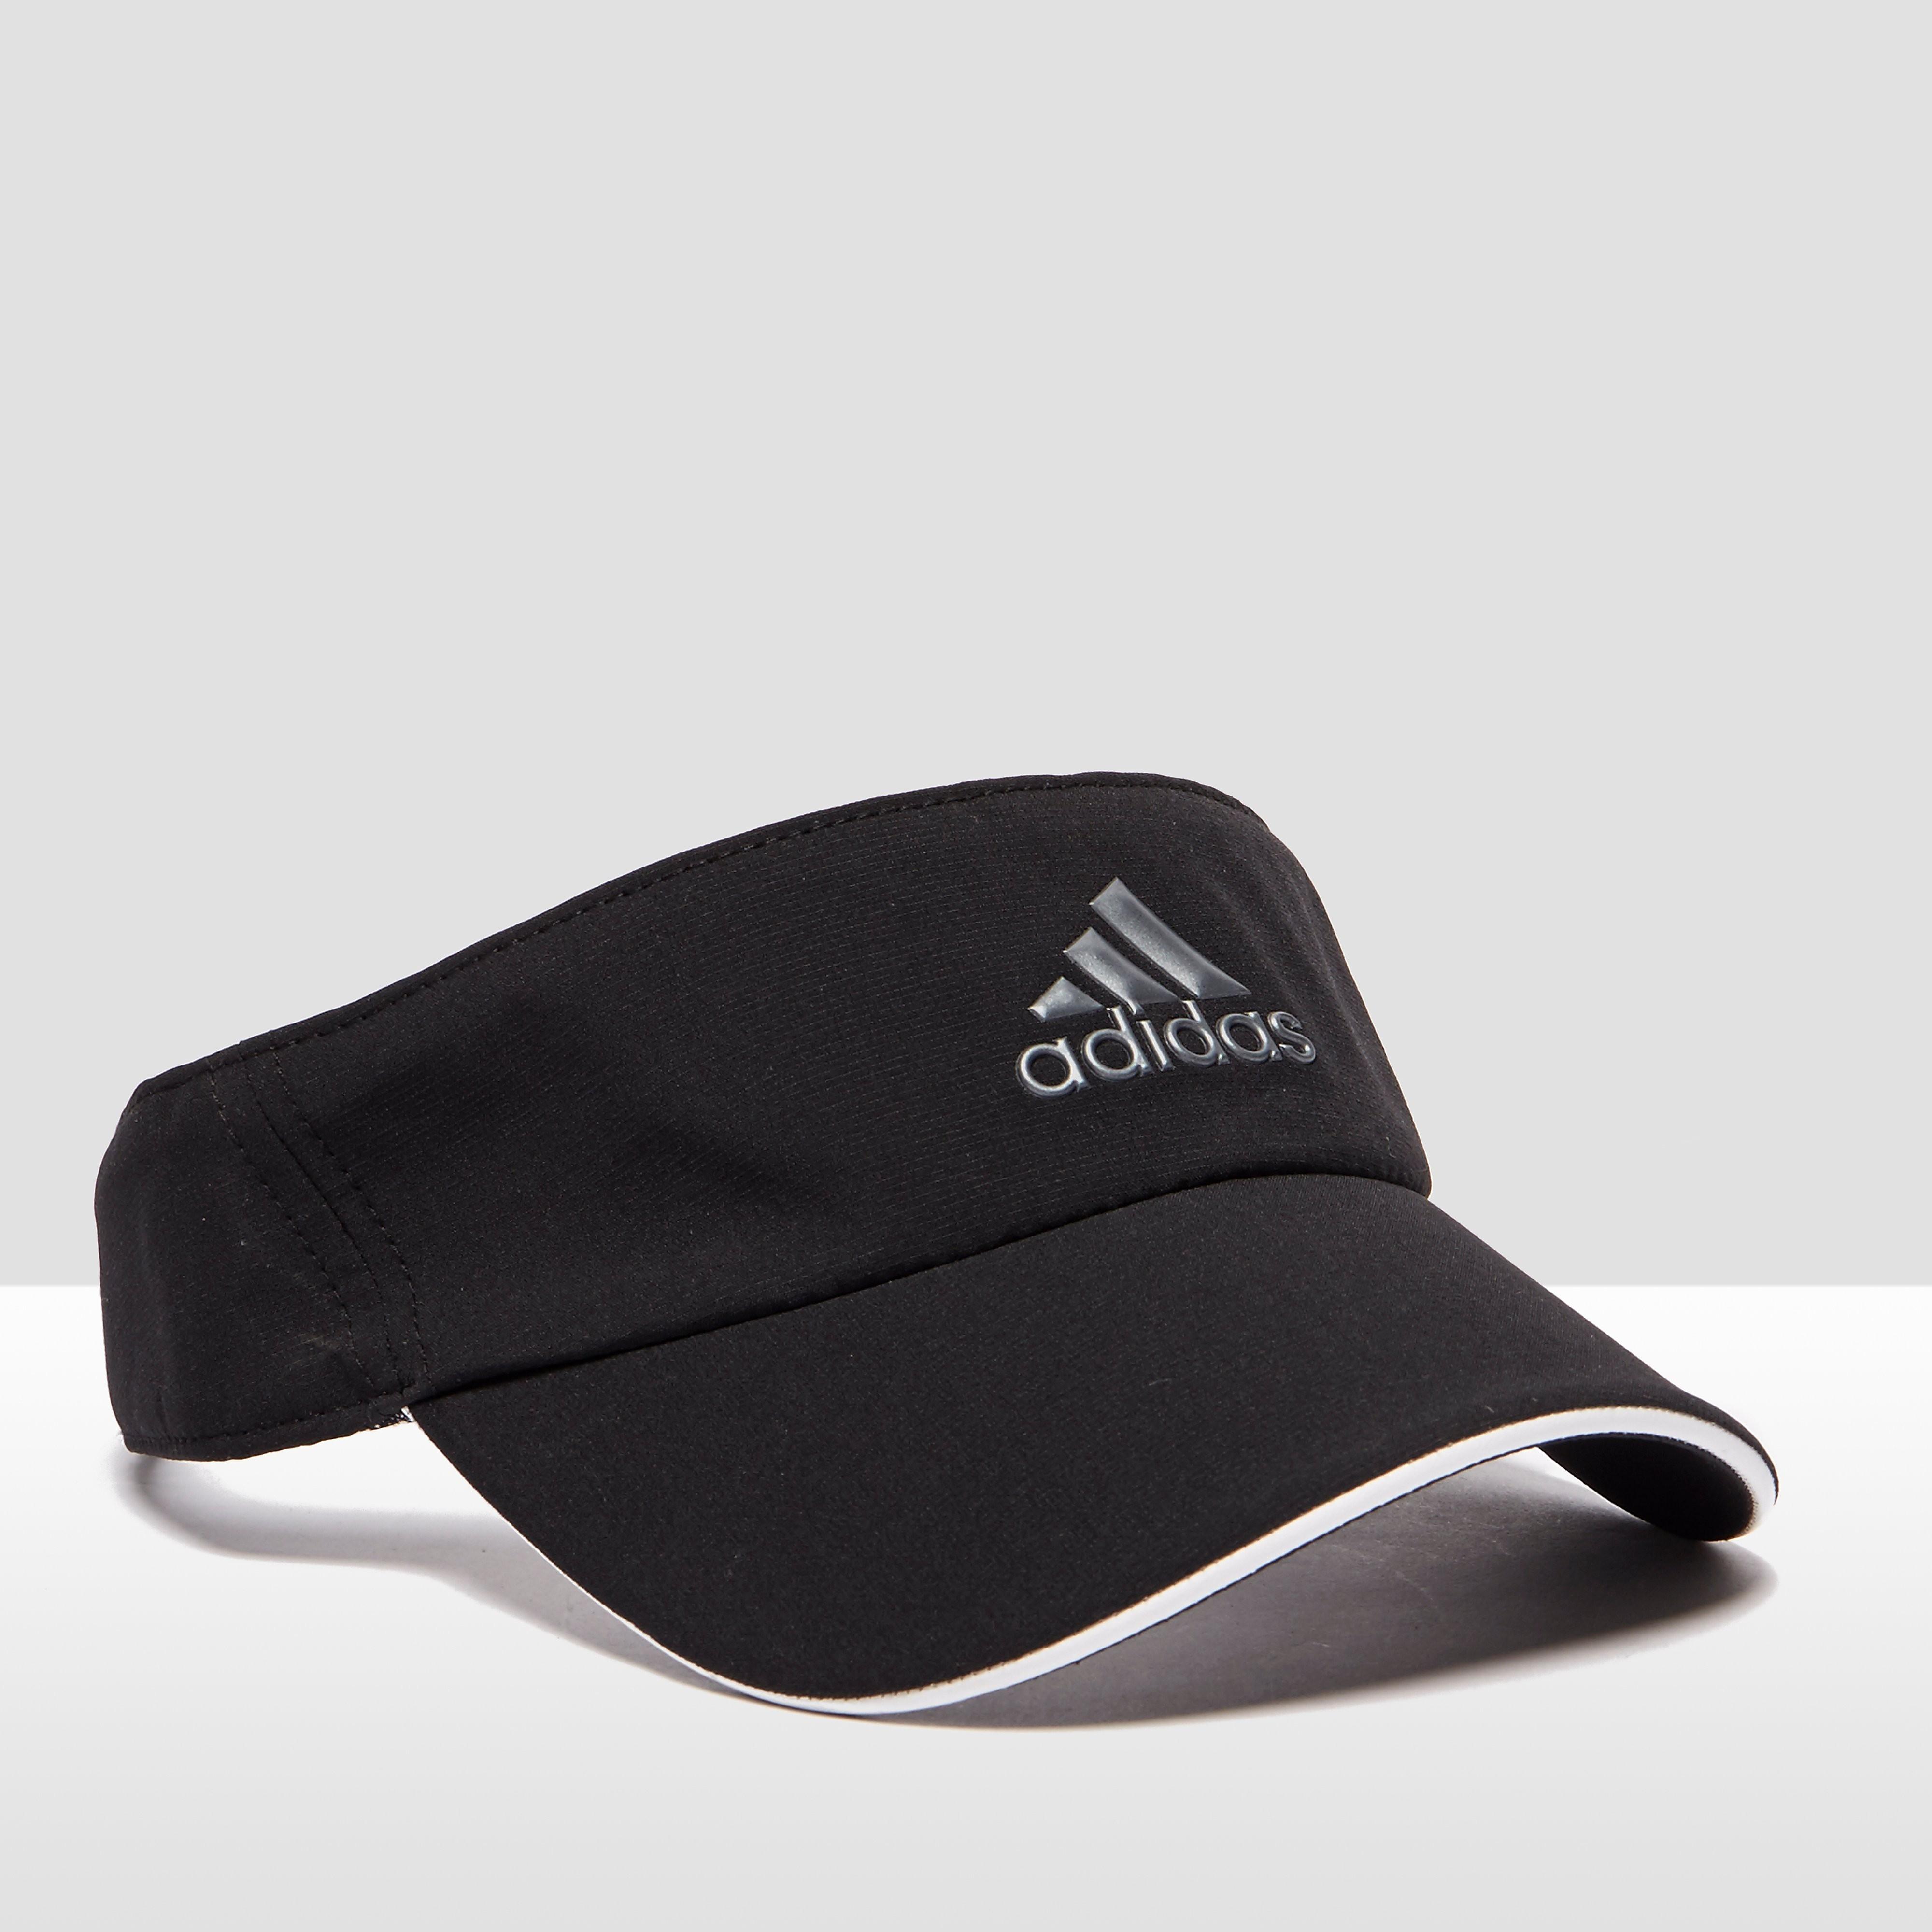 adidas Climalite Training Visor